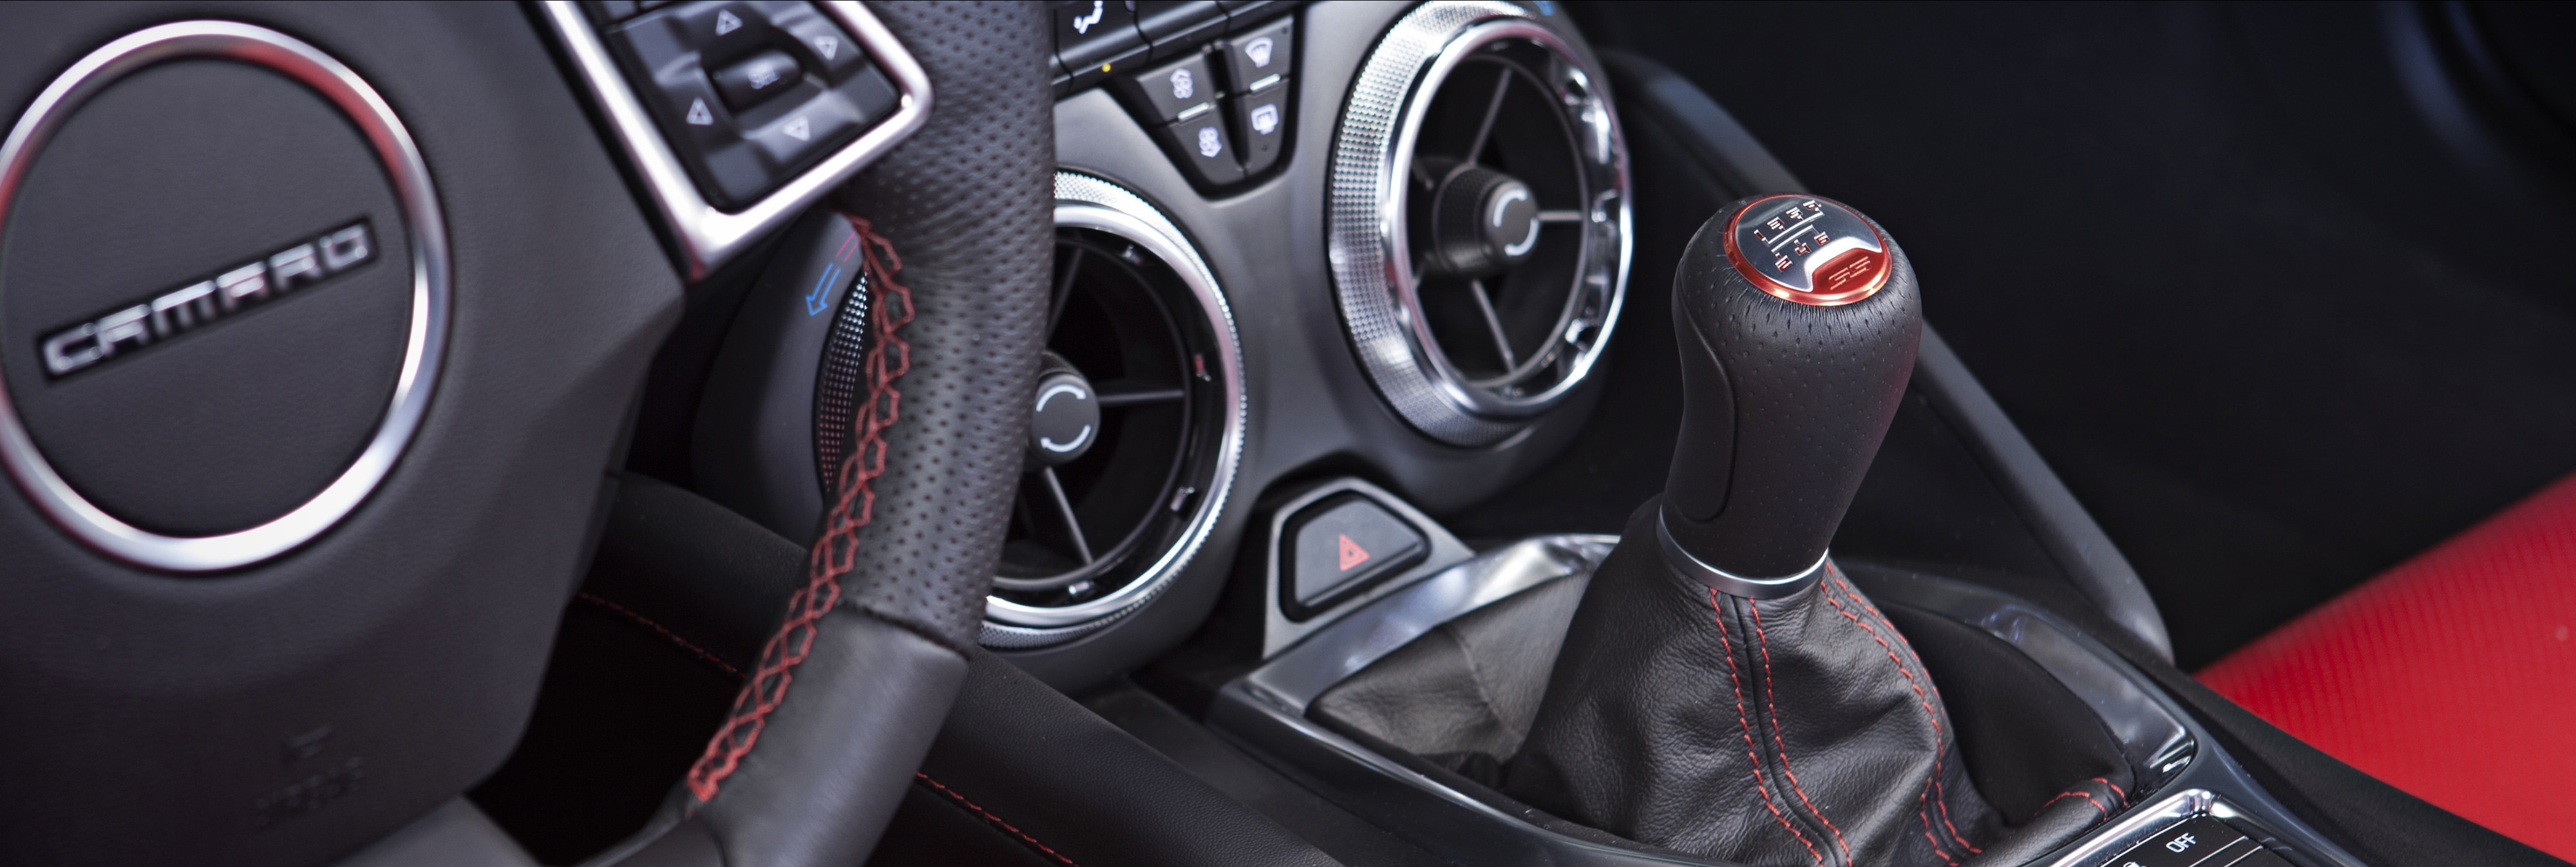 2016 Chevrolet Camaro Interior Detailed - autoevolution